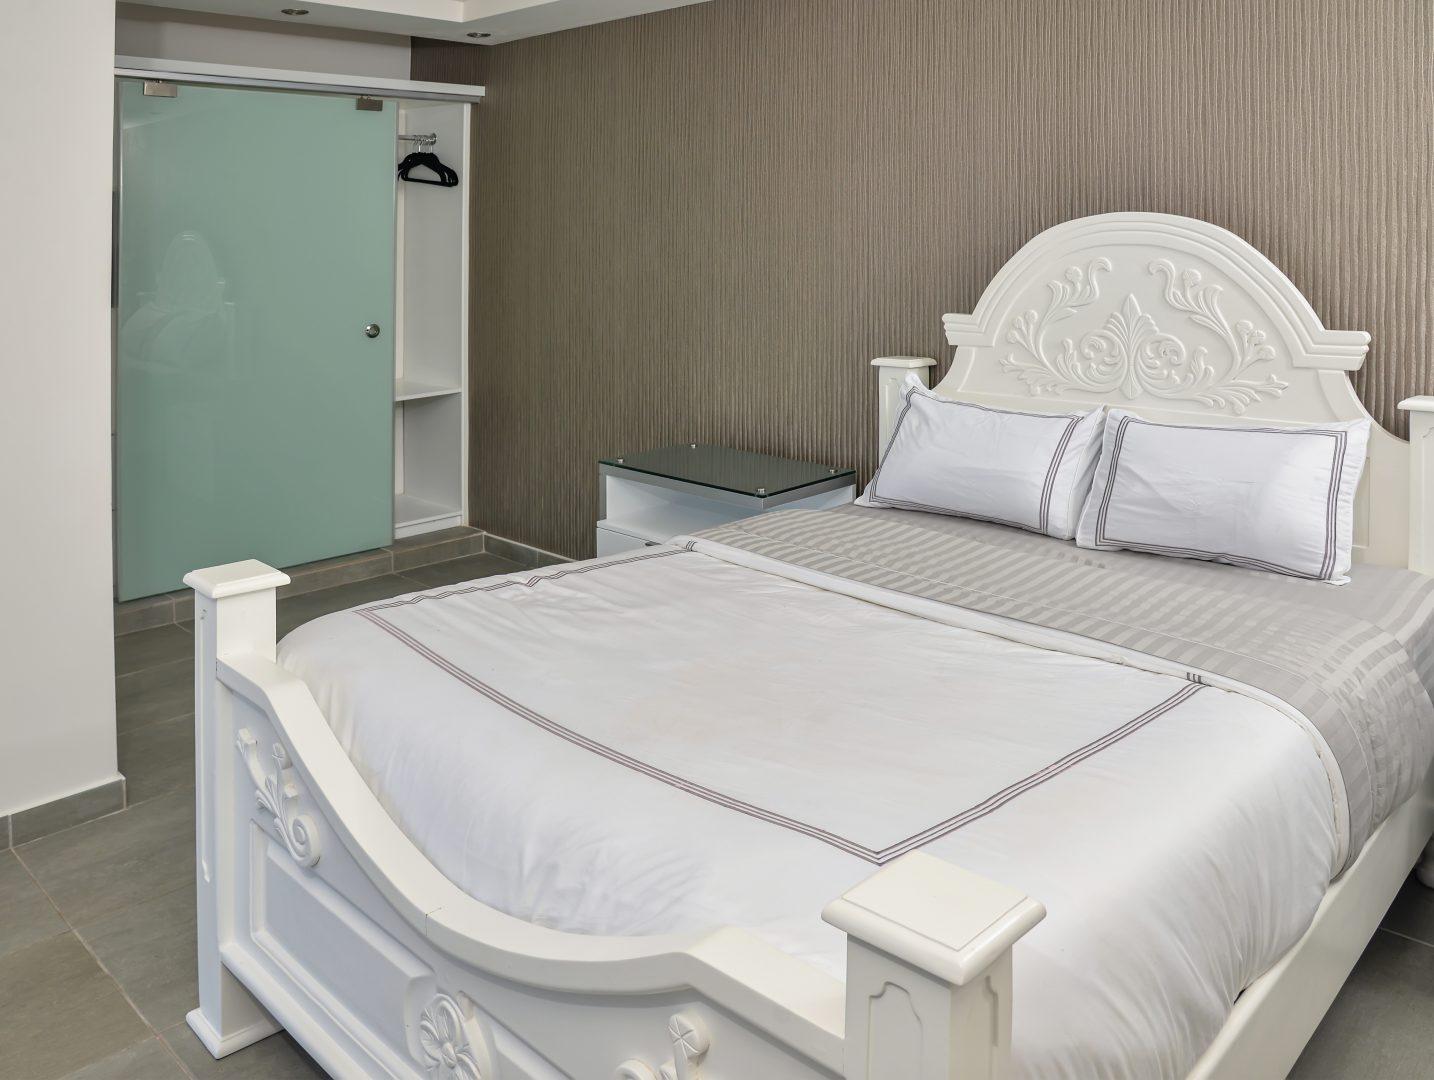 Poolside Room-11 Bedroom